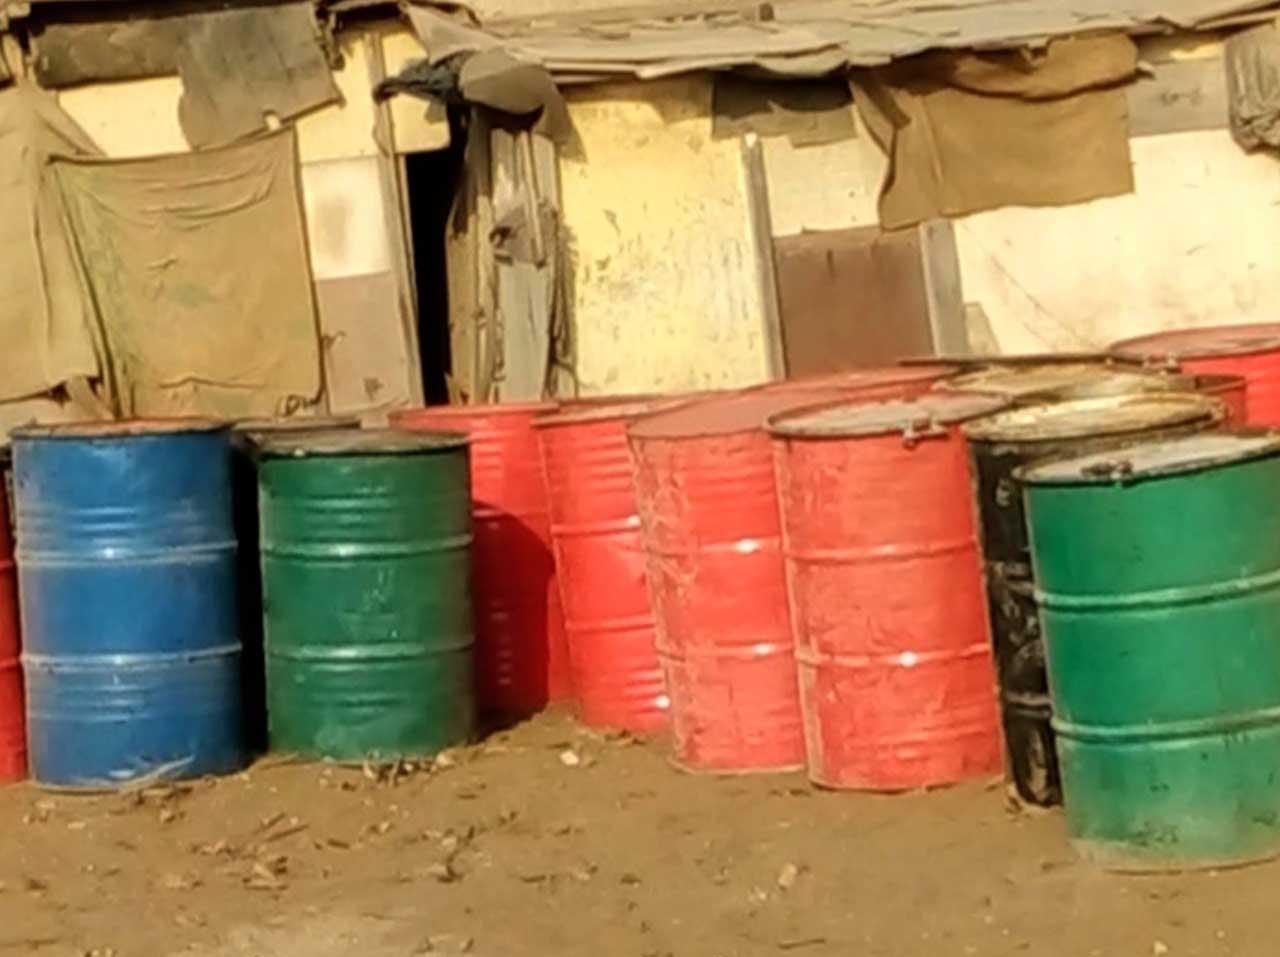 Despite warning by Interpol, hazardous mercury-infused oil ship anchored at Gadani ship-breaking yard near Karachi